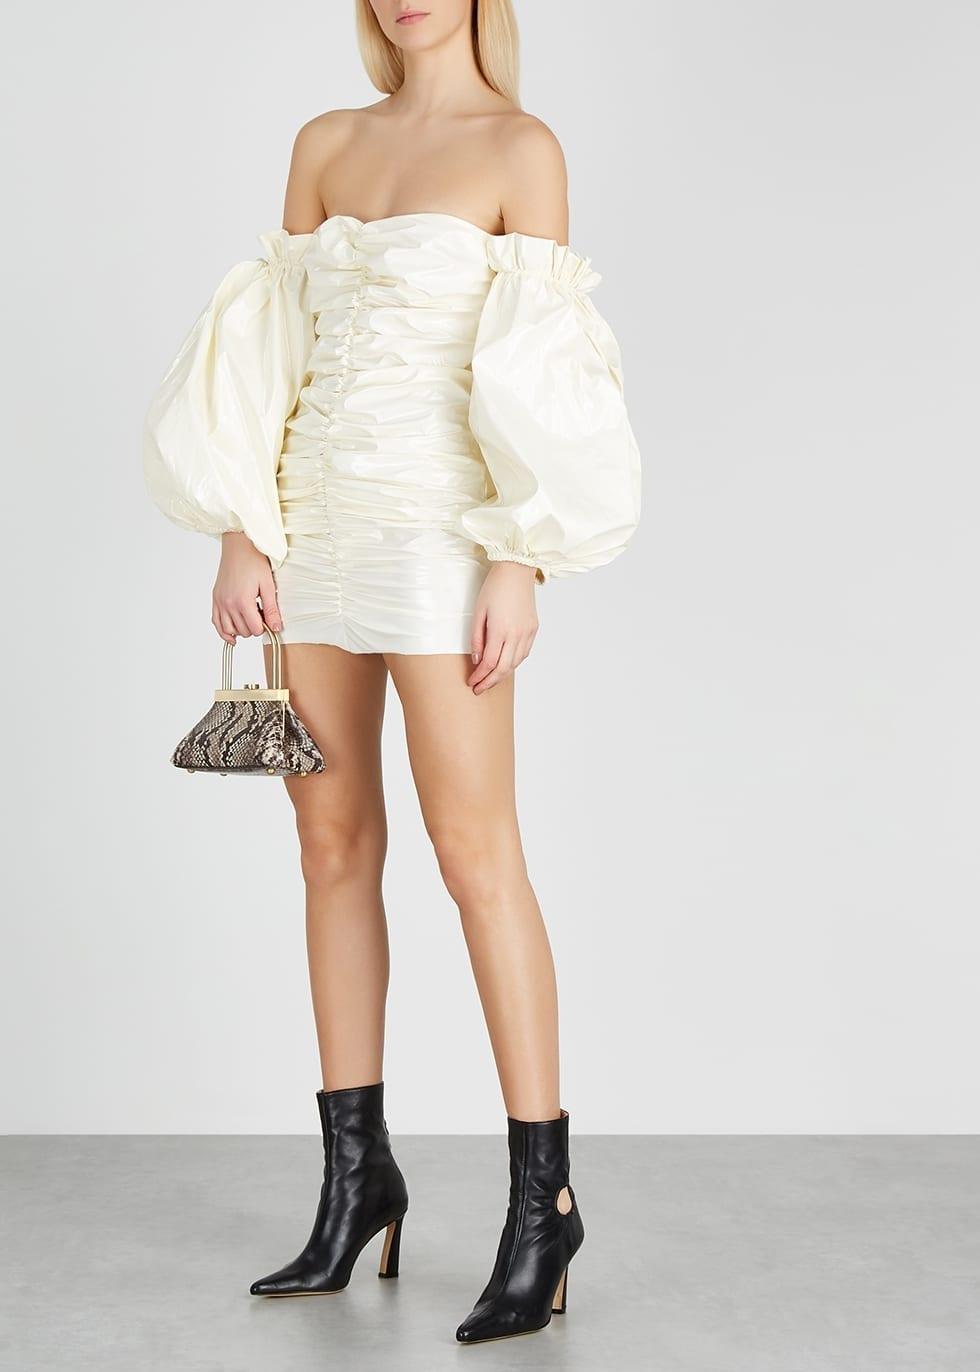 ROTATE BIRGER CHRISTENSEN Phoebe Ruched Pvc Mini Dress